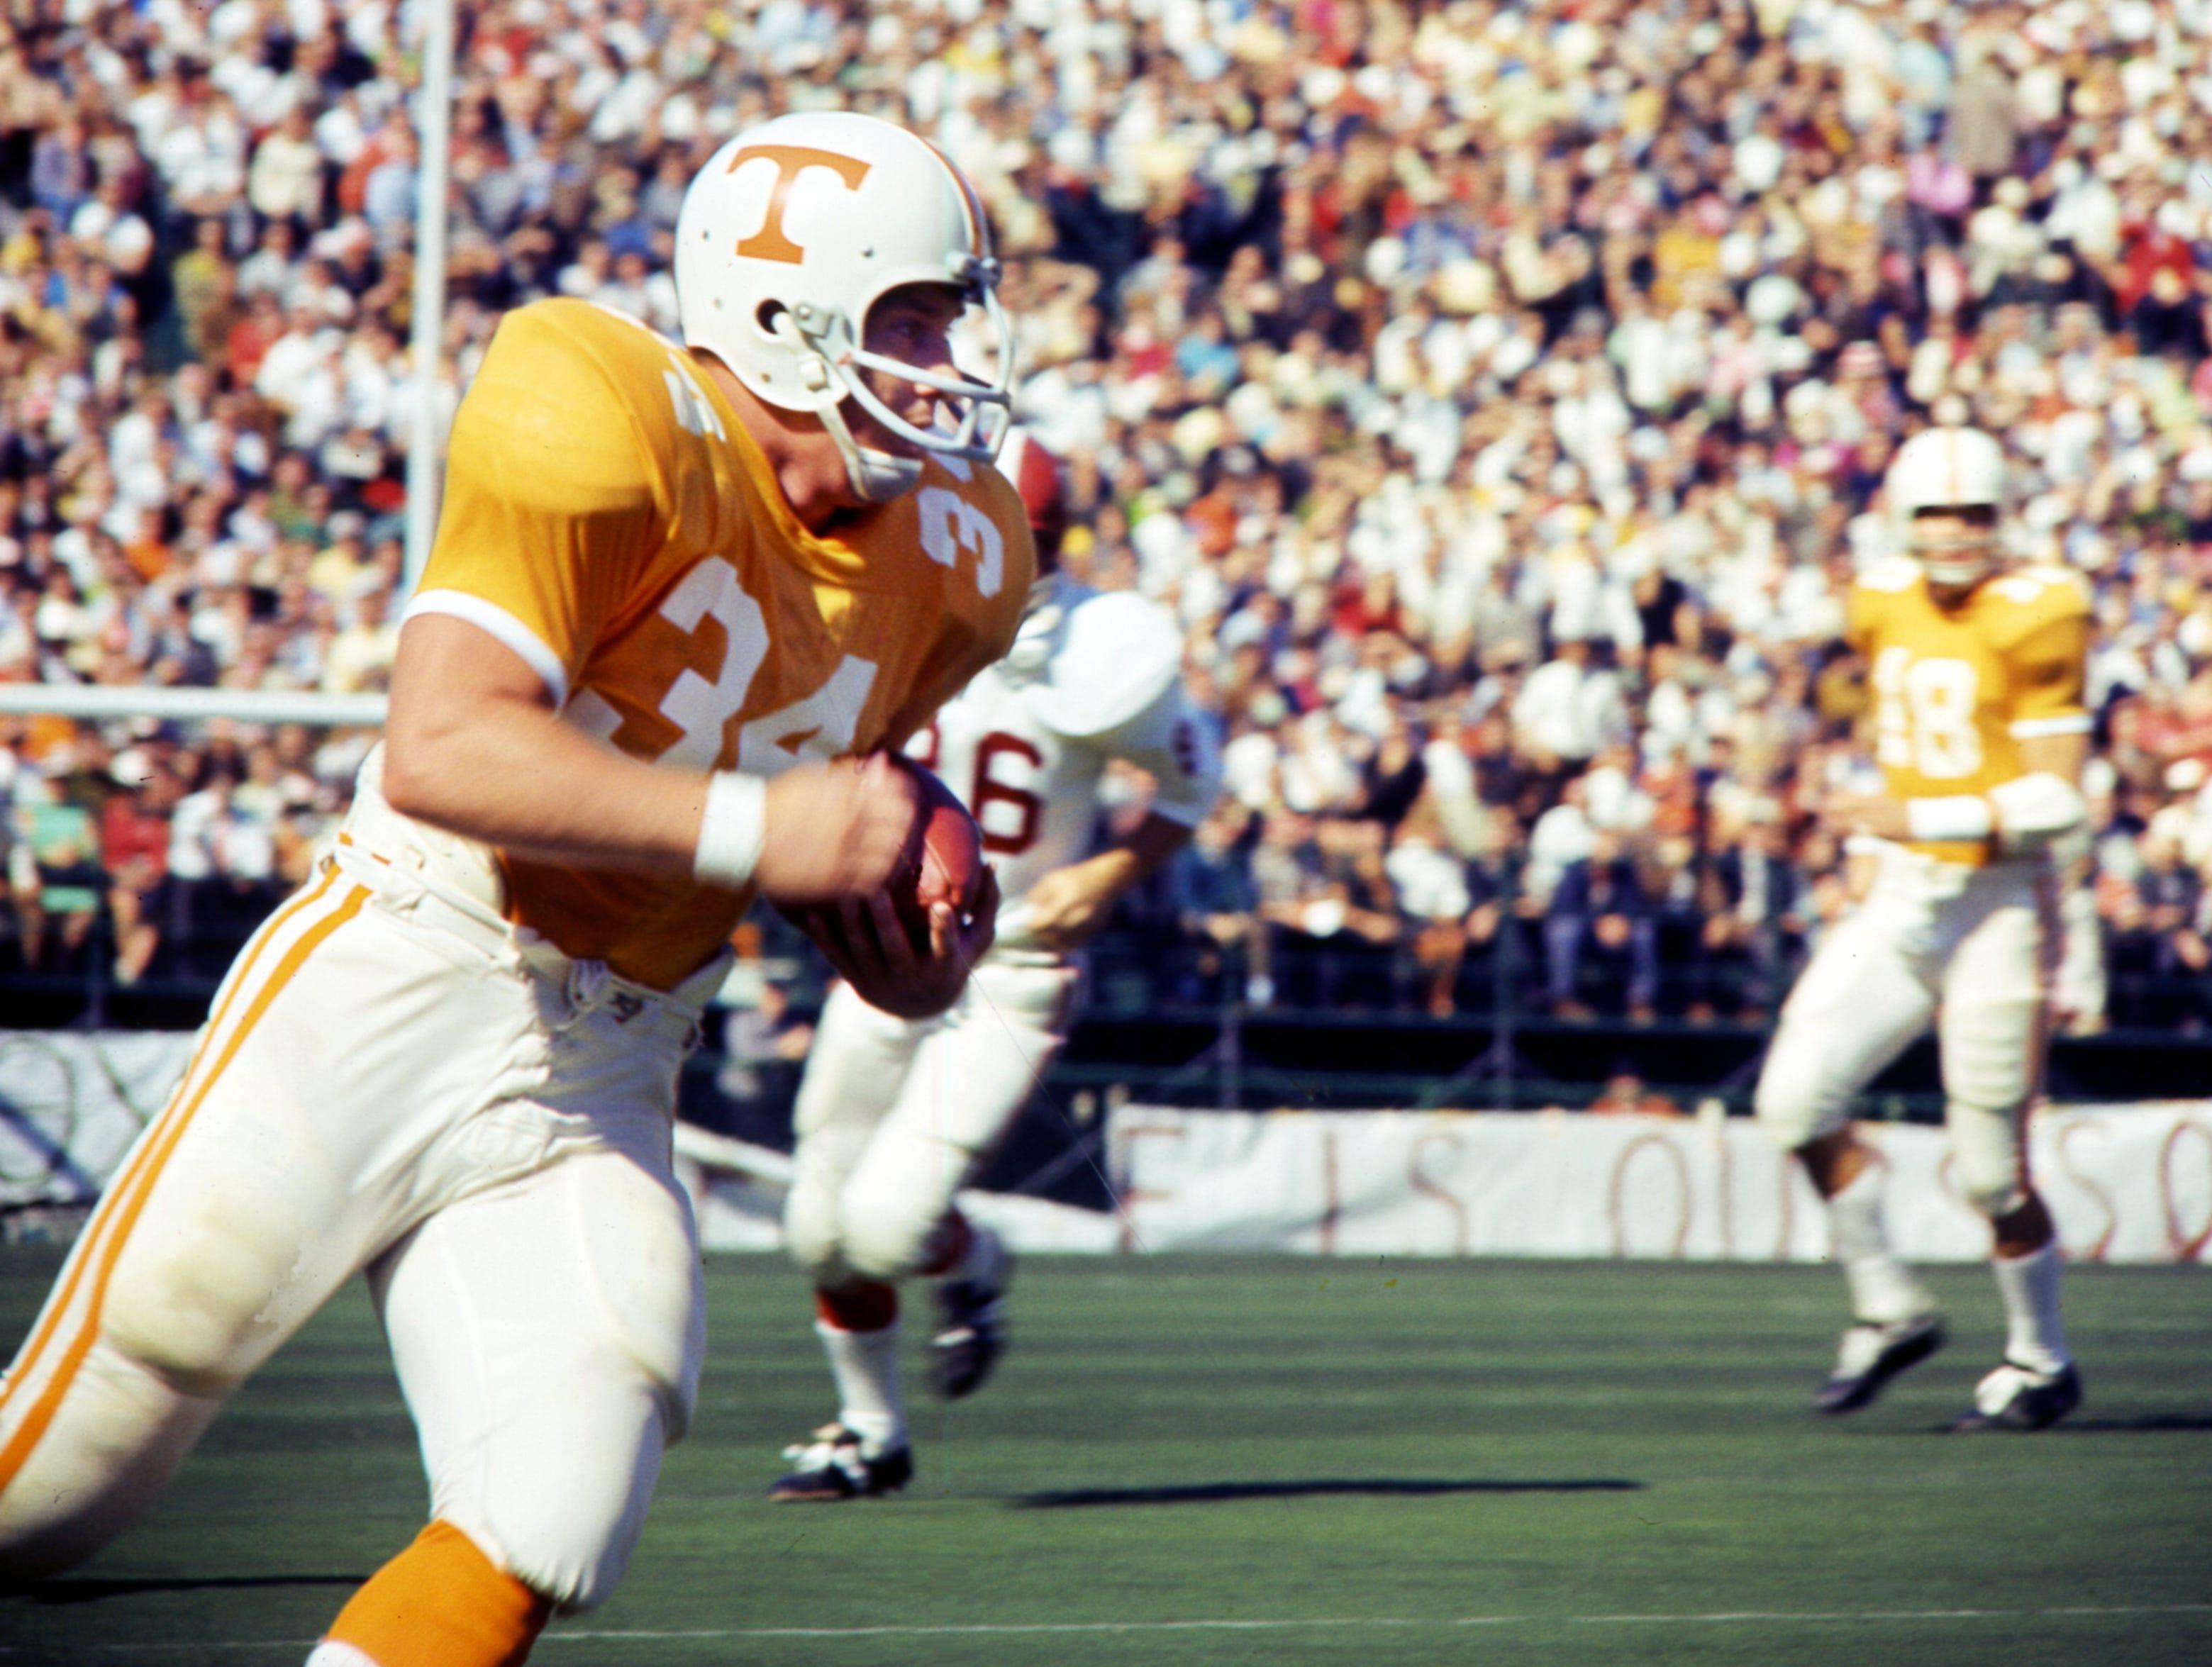 Tennessee senior fullback Richard Pickens (34) heads up field against Alabama before 63,392 fans at Neyland Stadium Oct. 19, 1968.